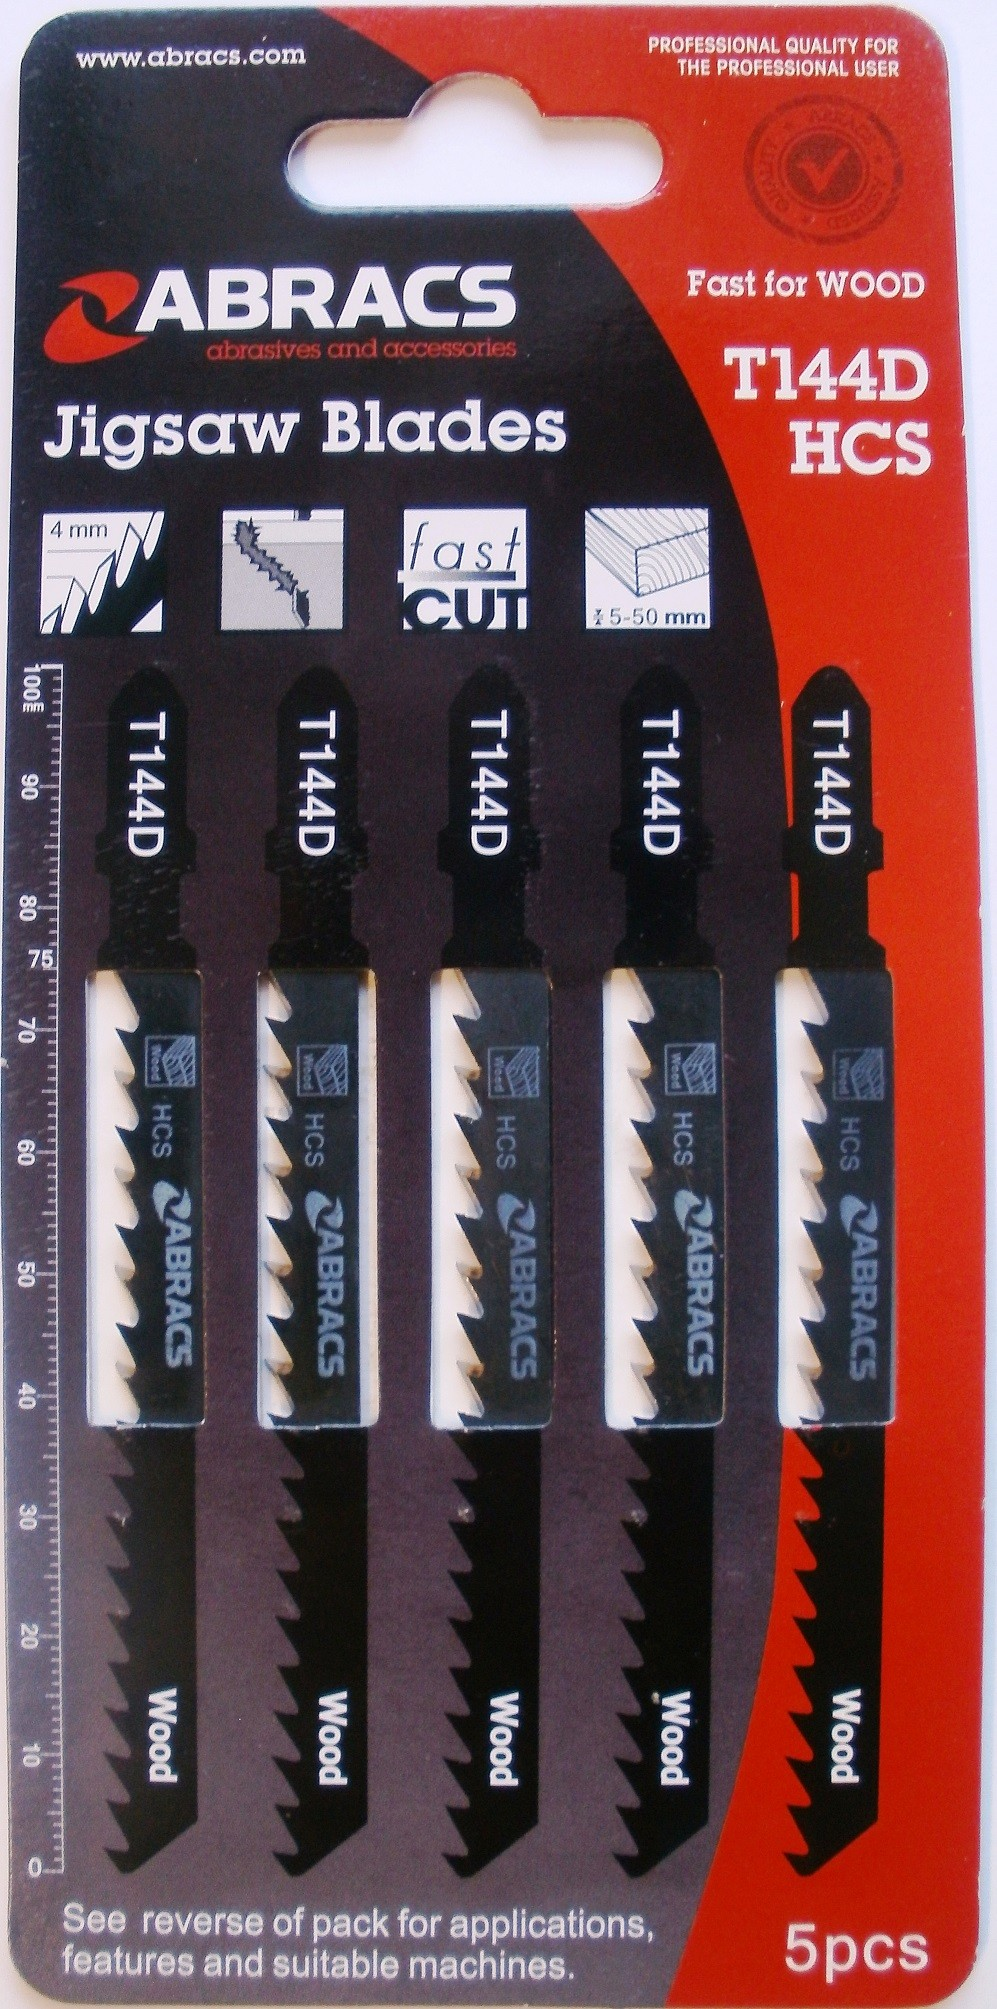 JIGSAW BLADES T144D (PK5) Abracs